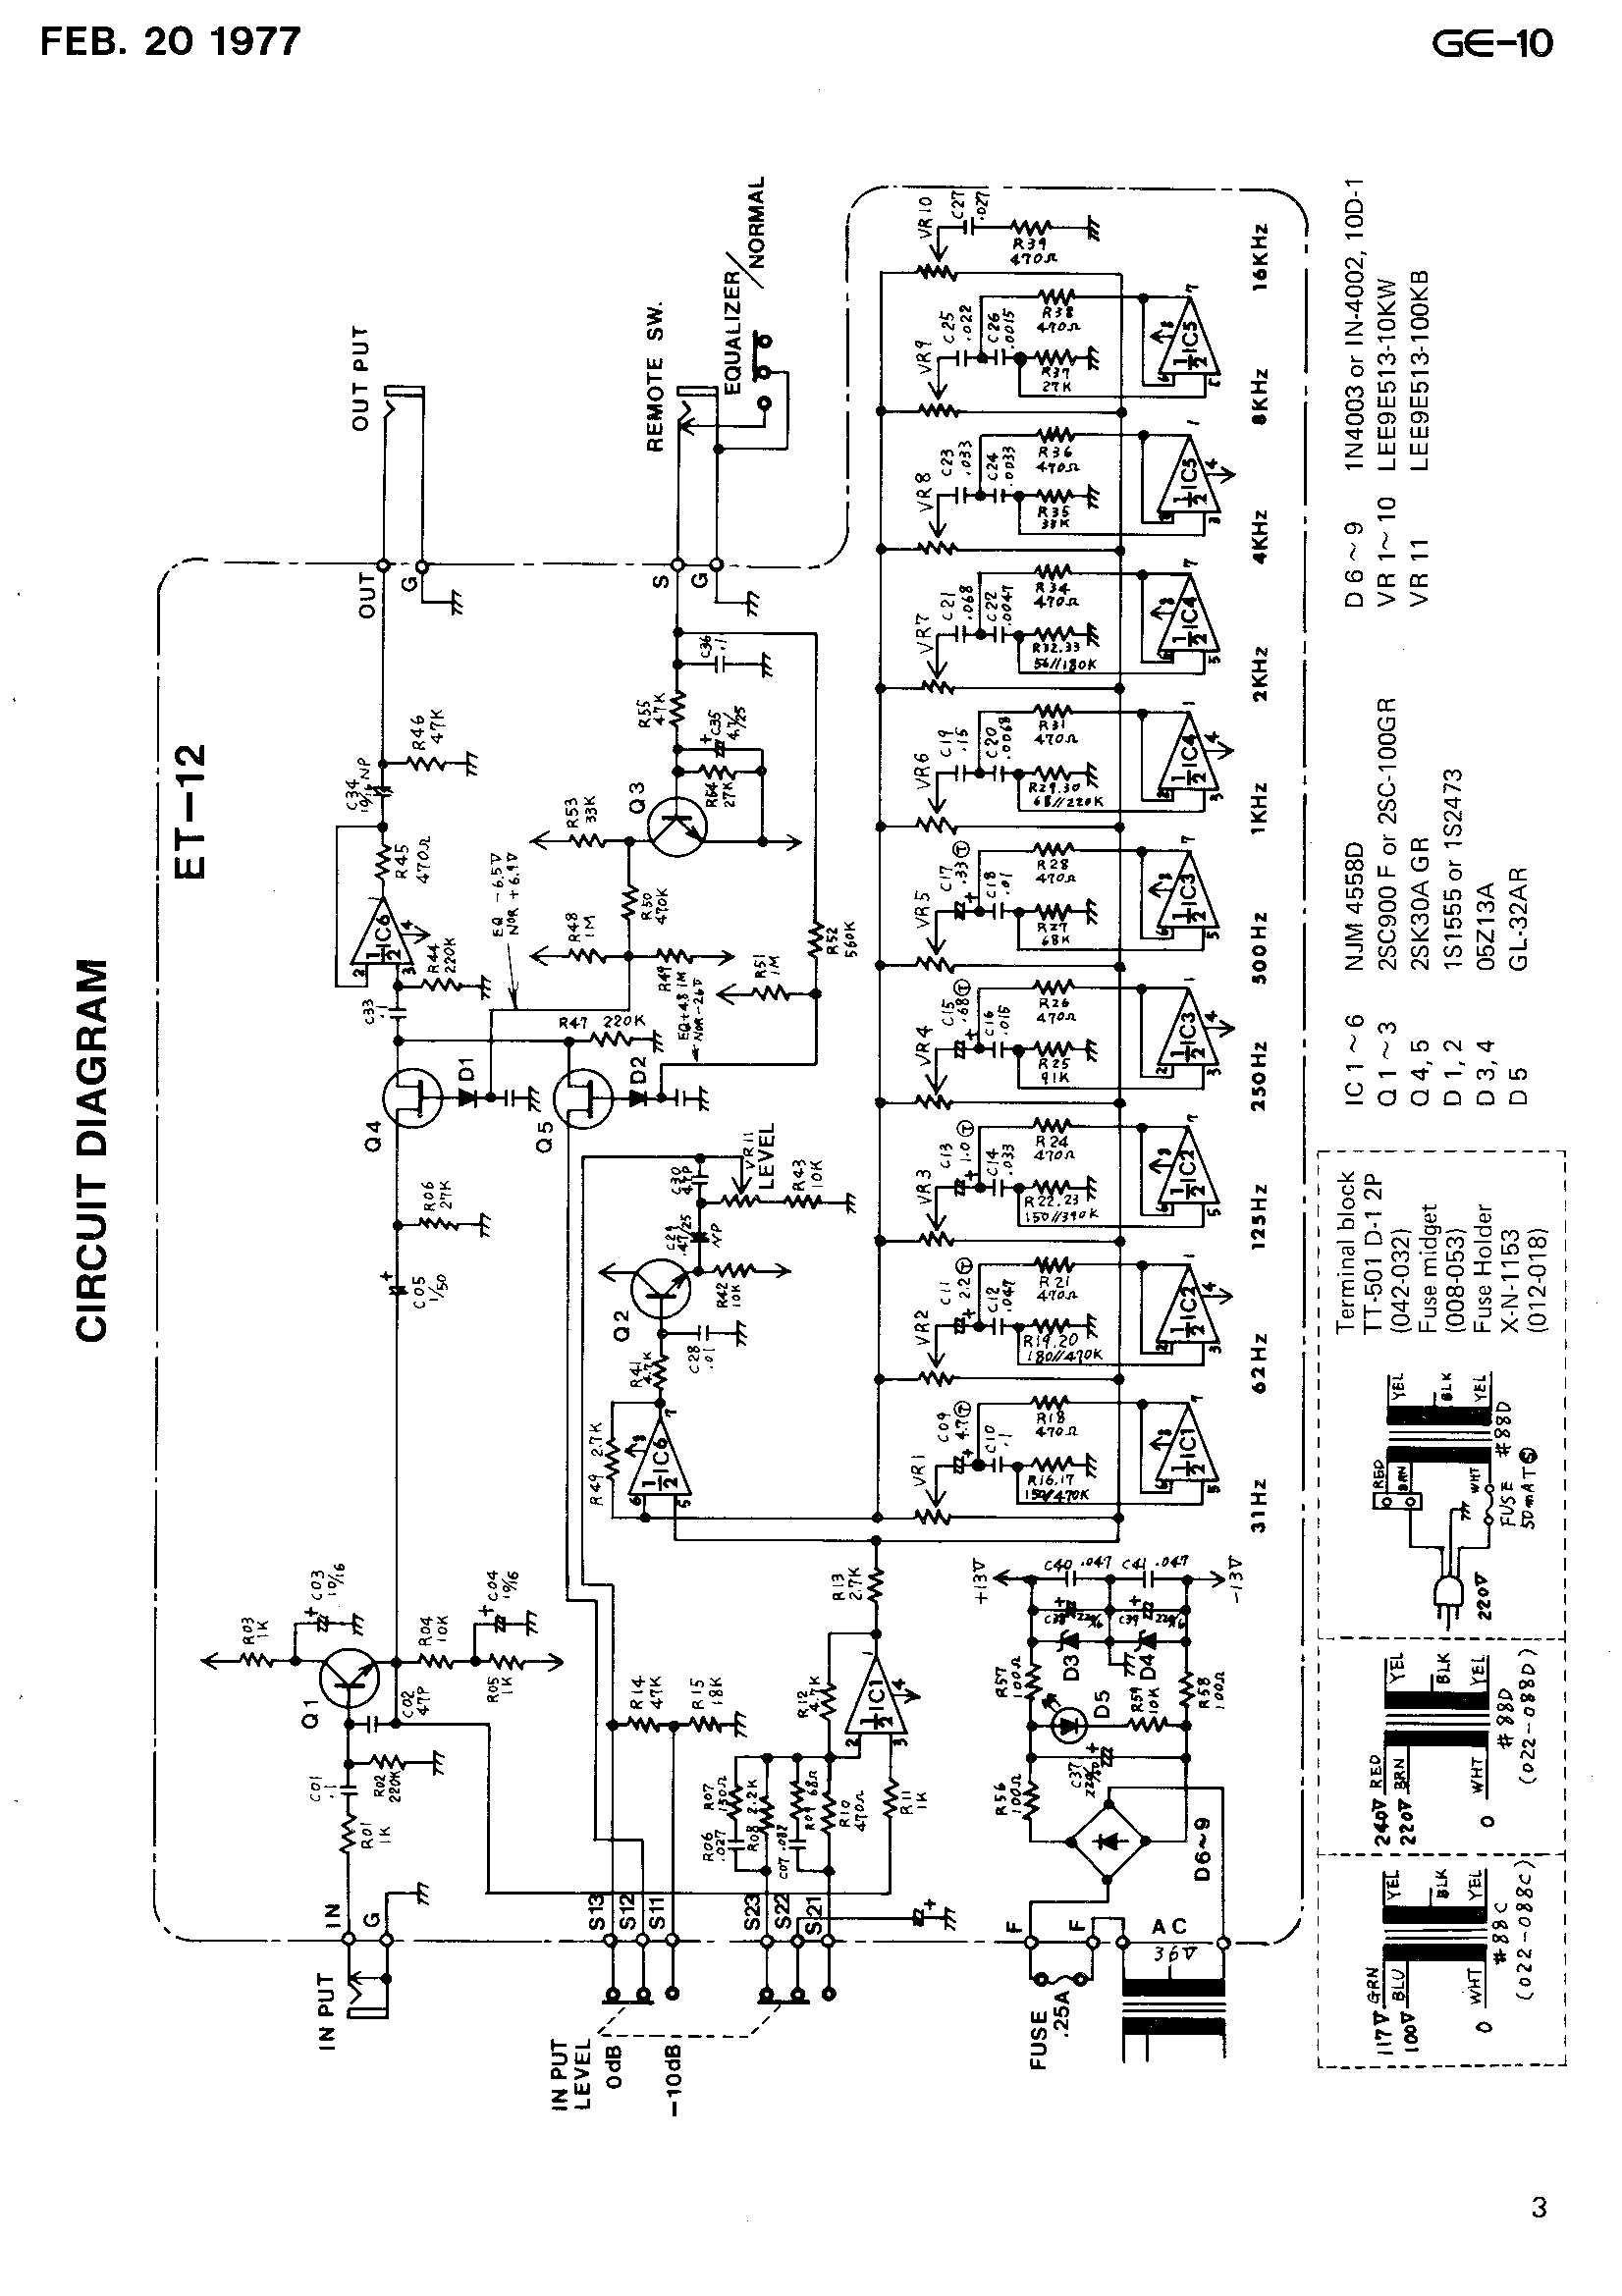 medium resolution of note 3 circuit diagram wiring diagram mega galaxy note 3 block diagram